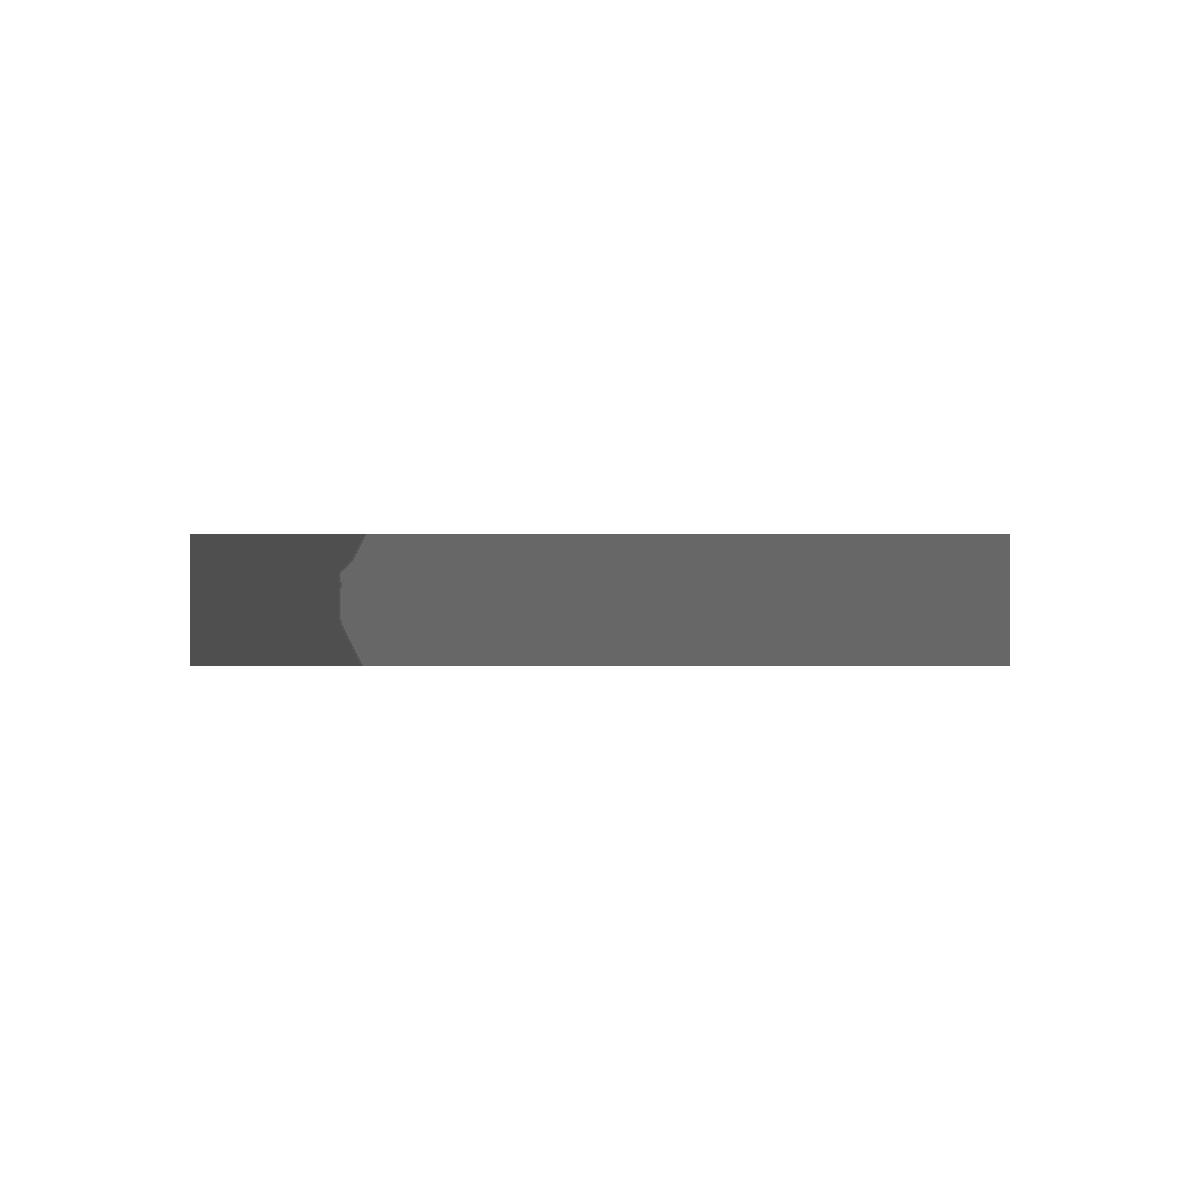 guideware